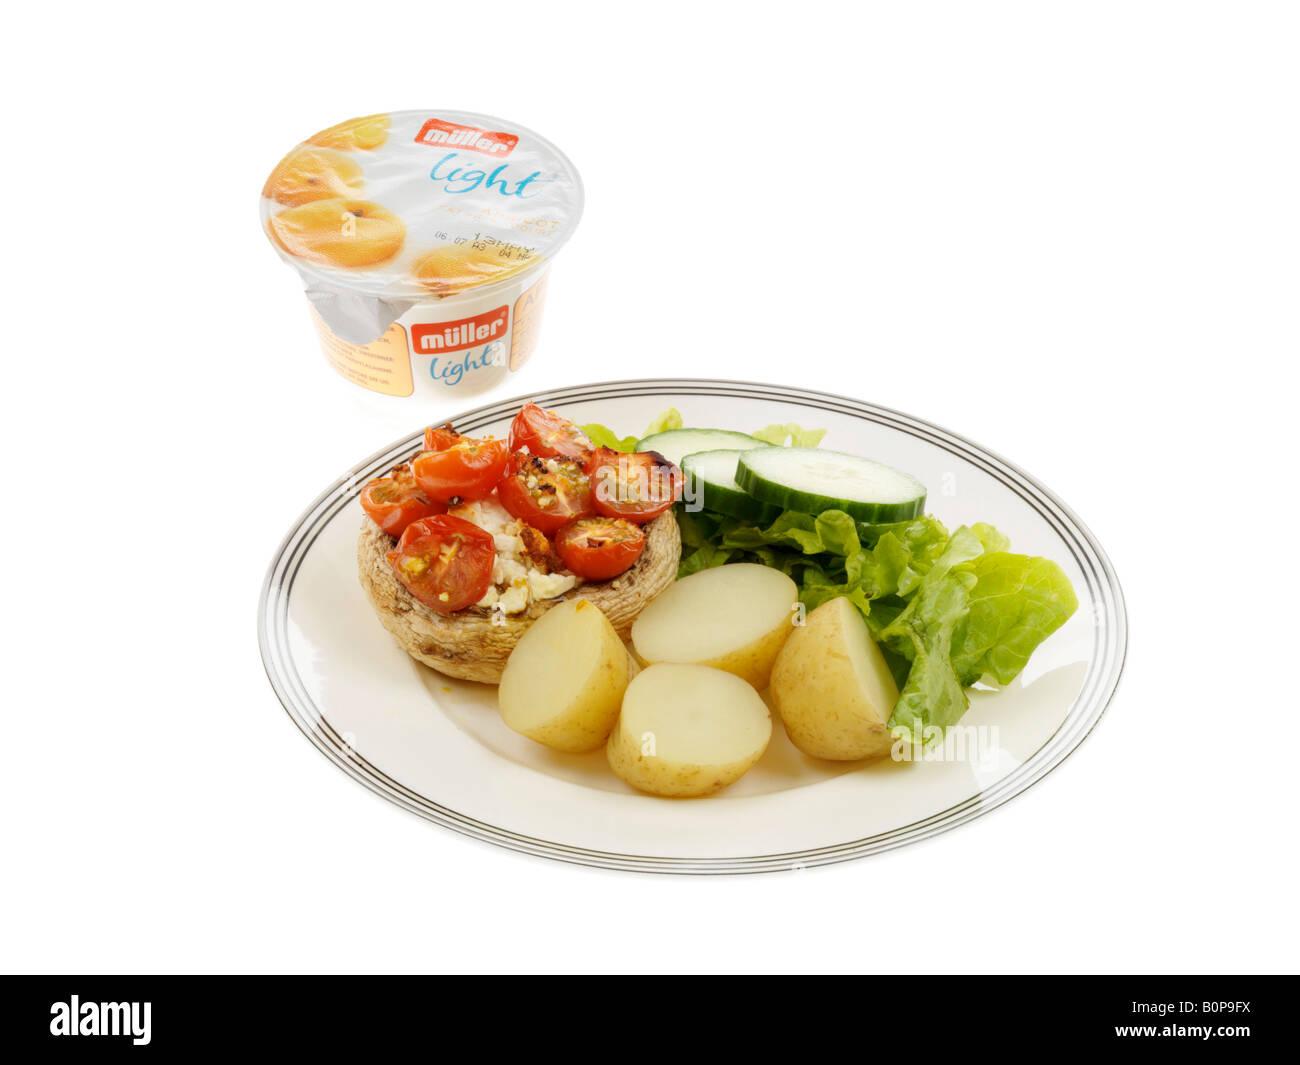 Stuffed Mushrrom with Salad and New Potatoes Stock Photo